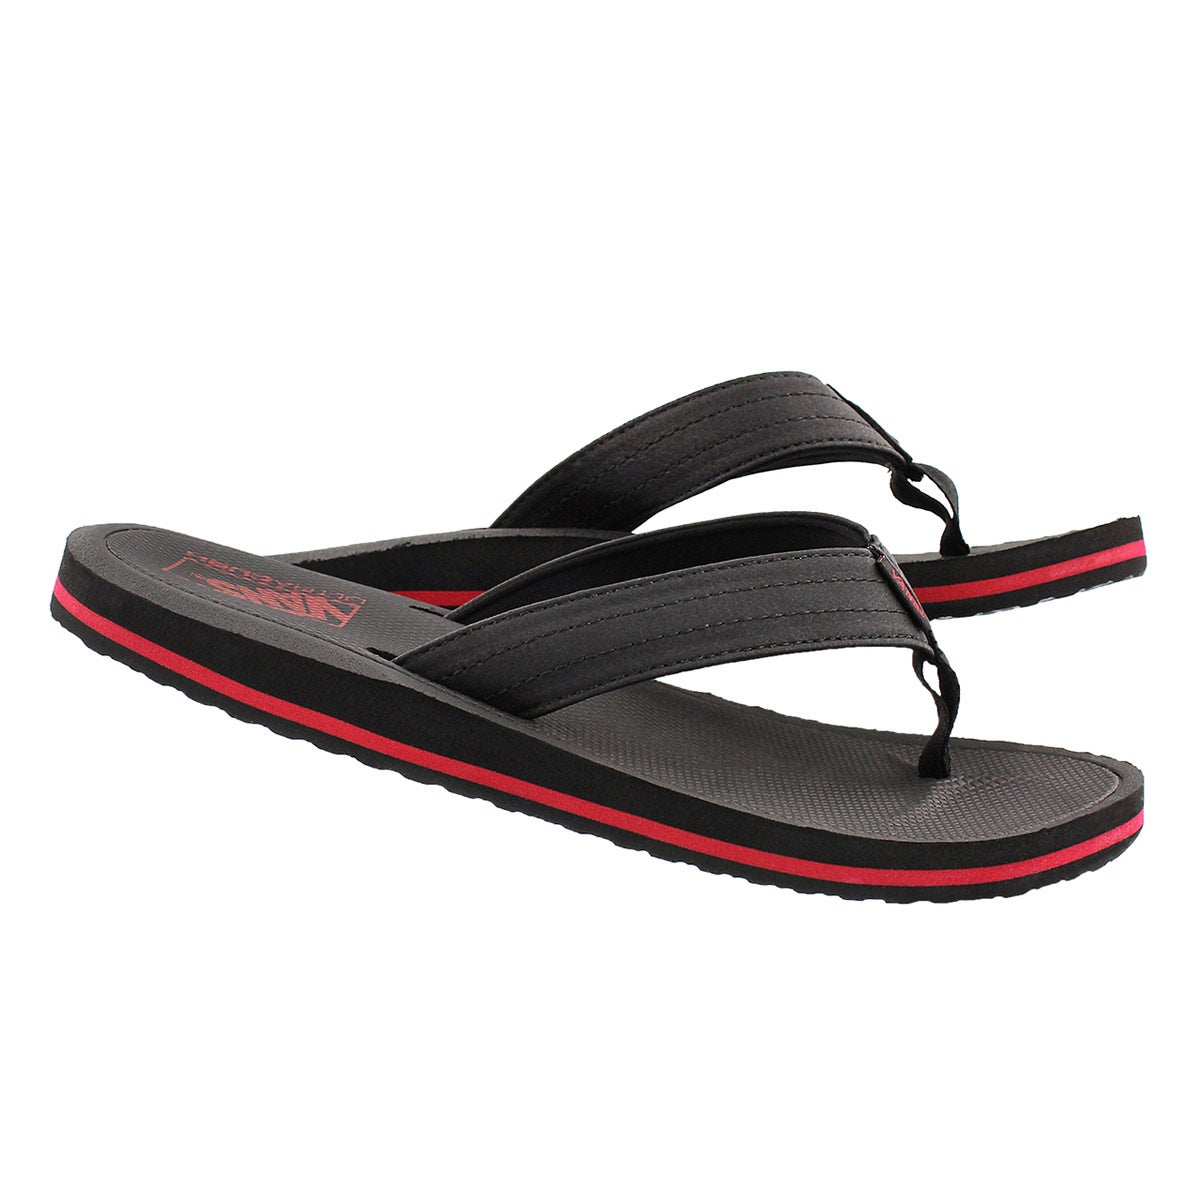 Mns Palmdale black/red flip flop